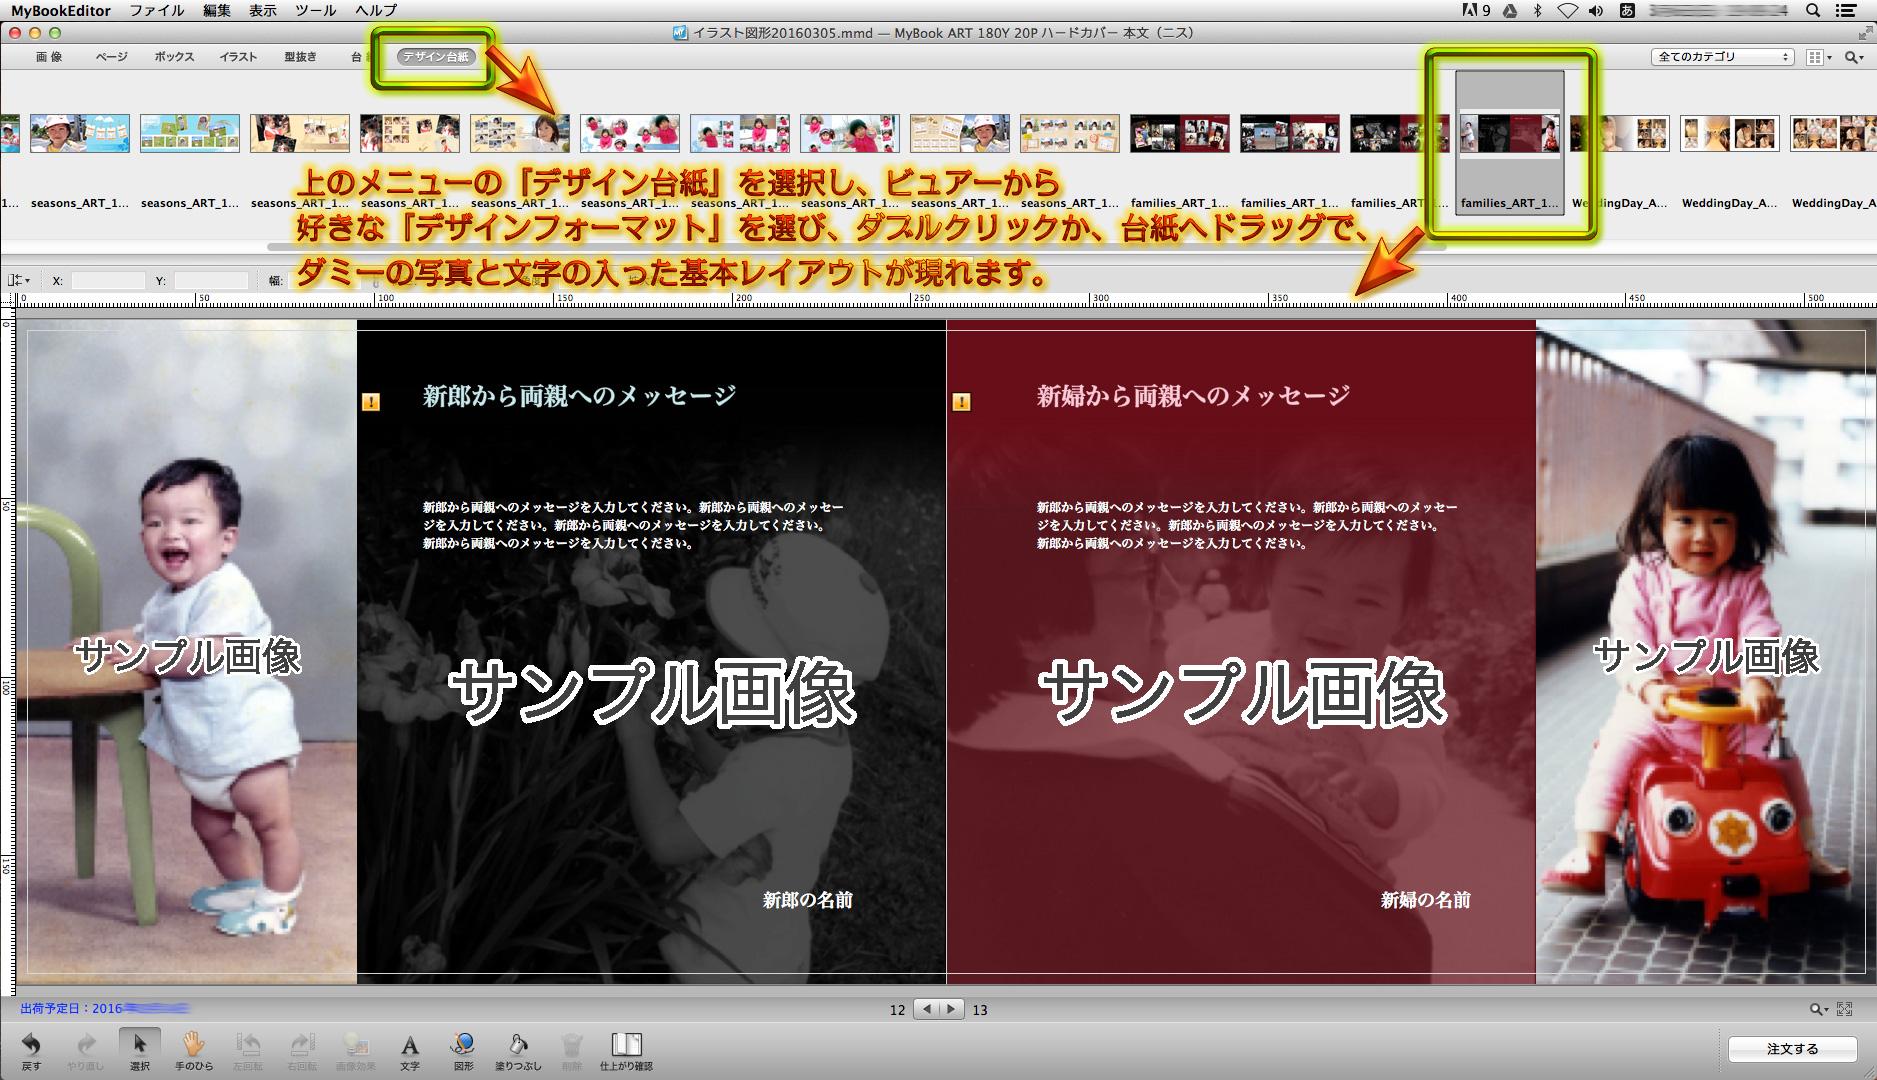 http://moritetsu.info/car/img/mb158design.jpg